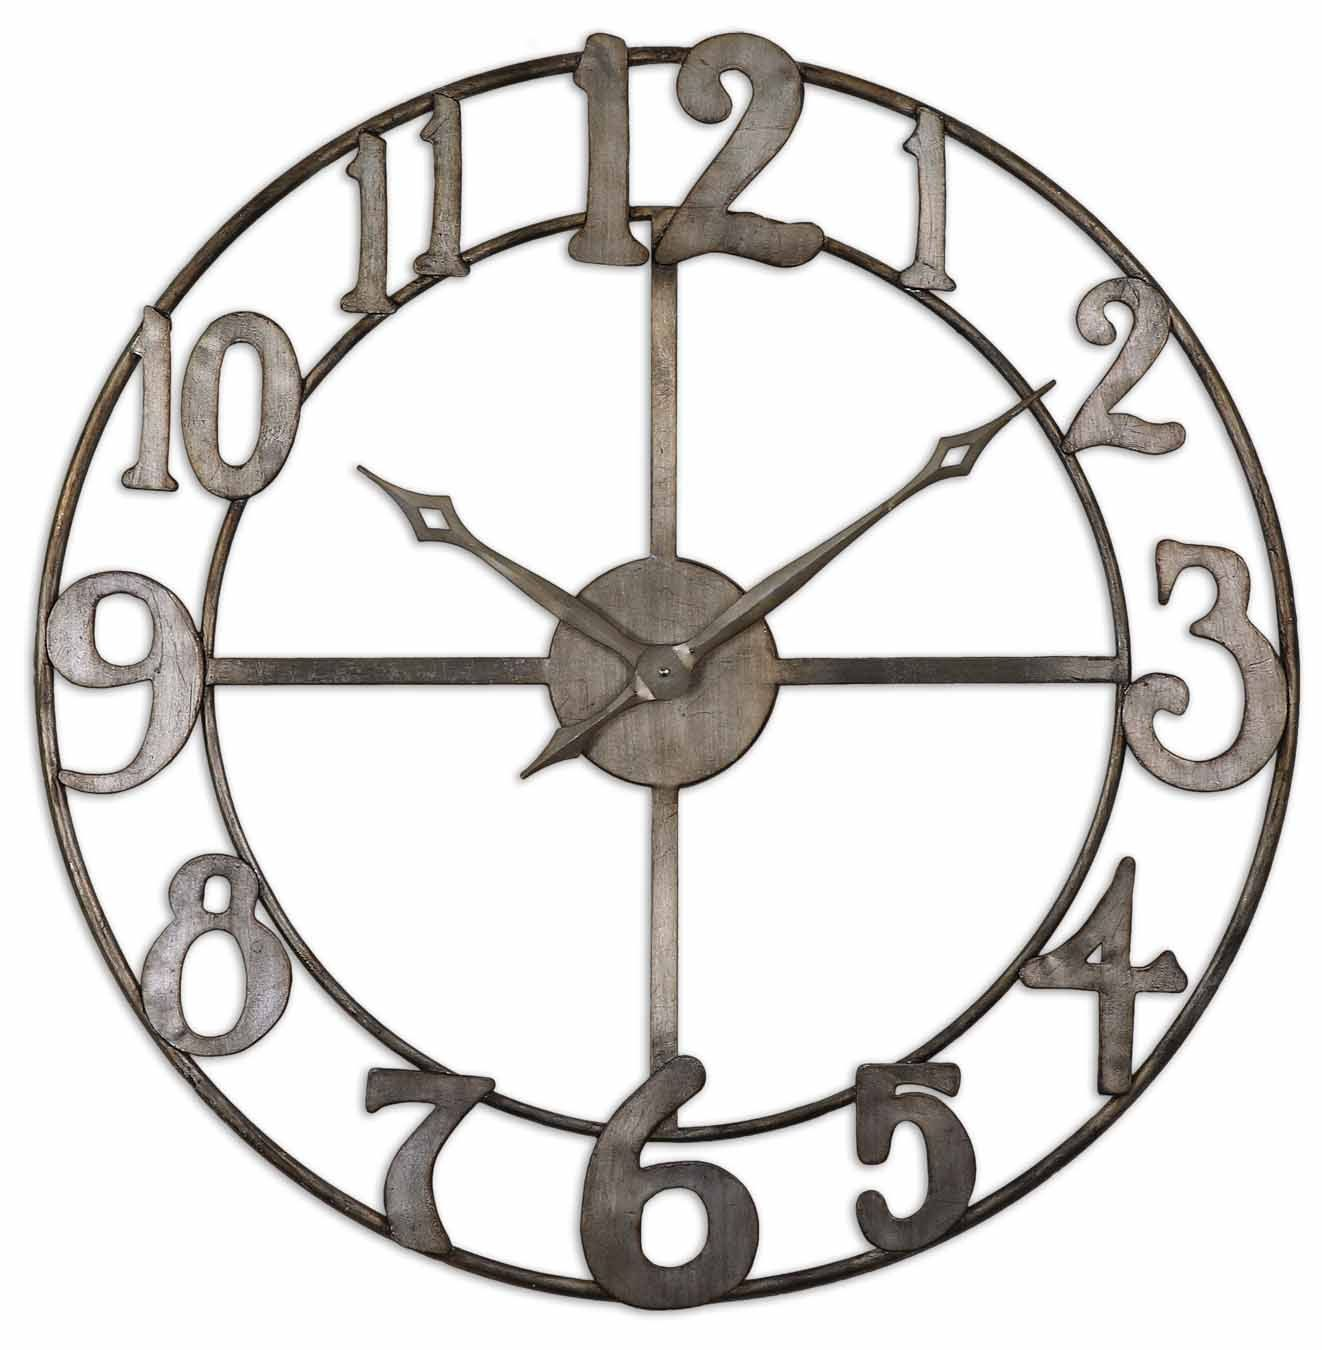 Extra large kitchen wall clocks yonkoutei pinterest